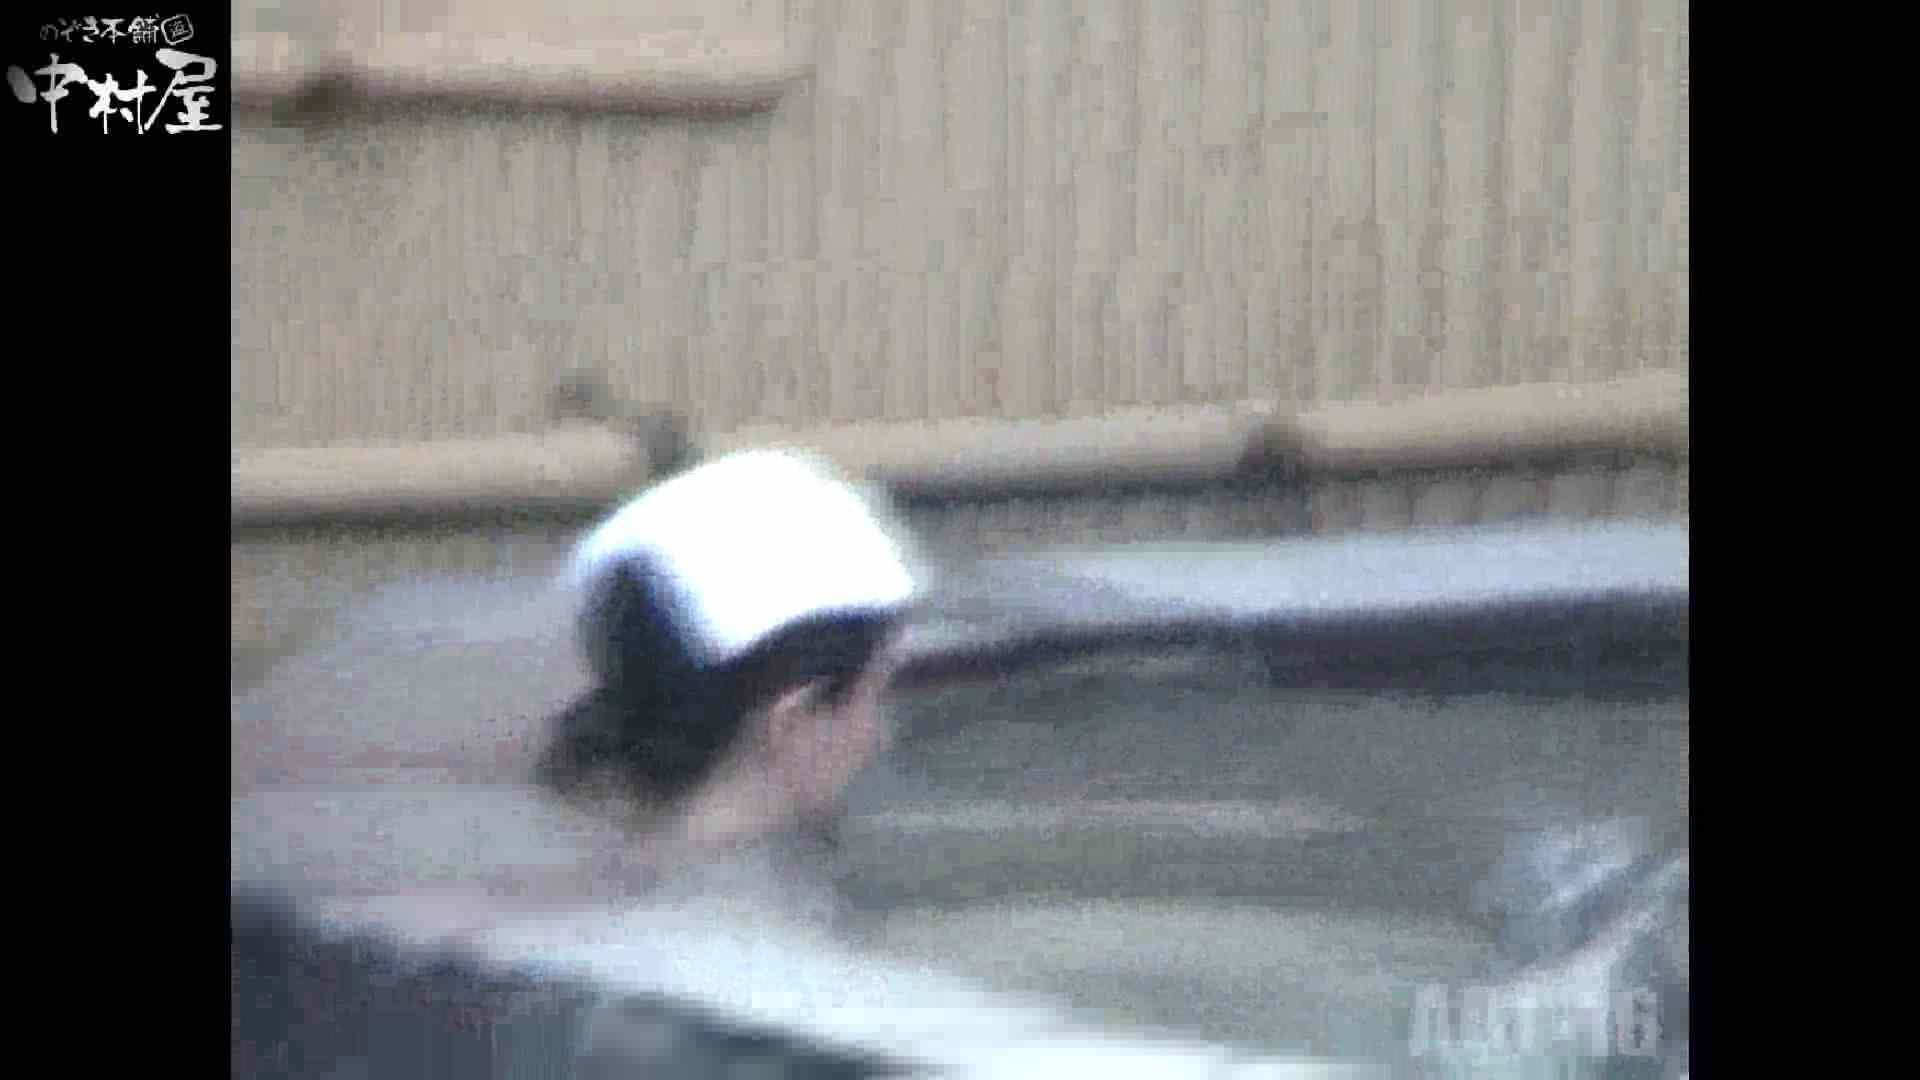 Aquaな露天風呂Vol.880潜入盗撮露天風呂十六判湯 其の六 露天 | 潜入シリーズ  95pic 17